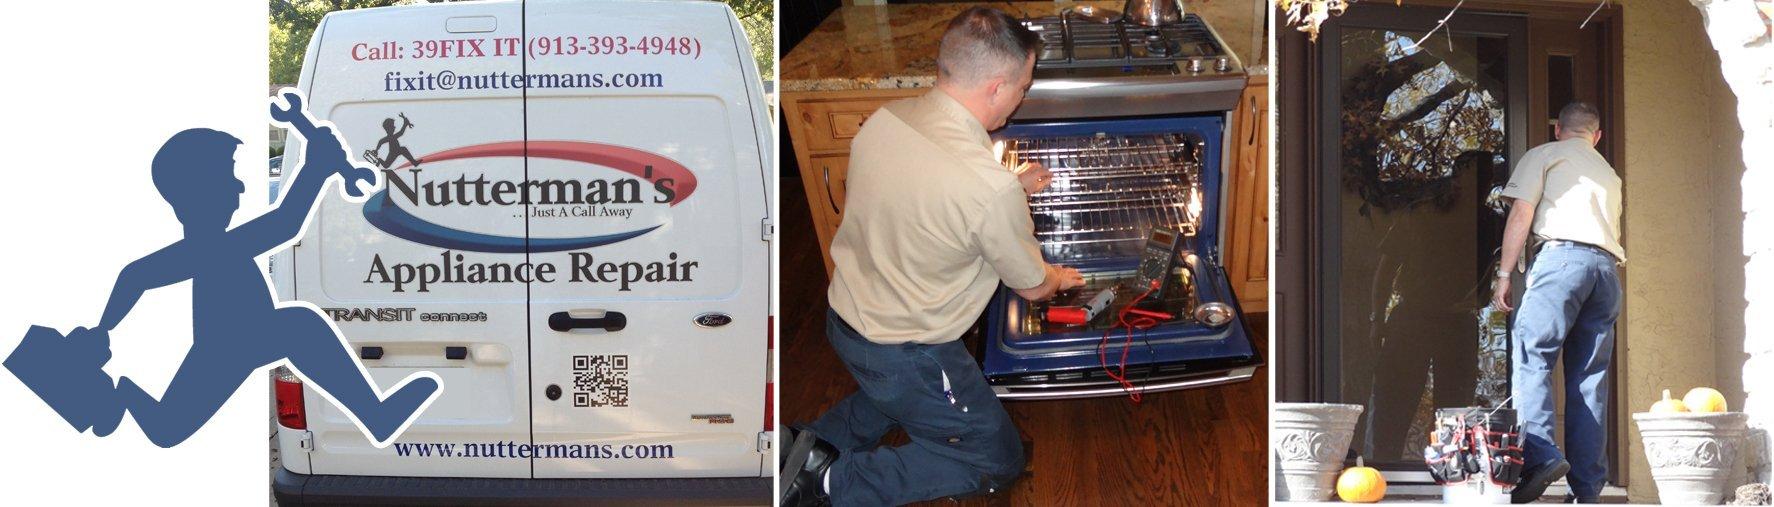 Overland Park Appliance Repair. Overland Park KS Appliance Repair